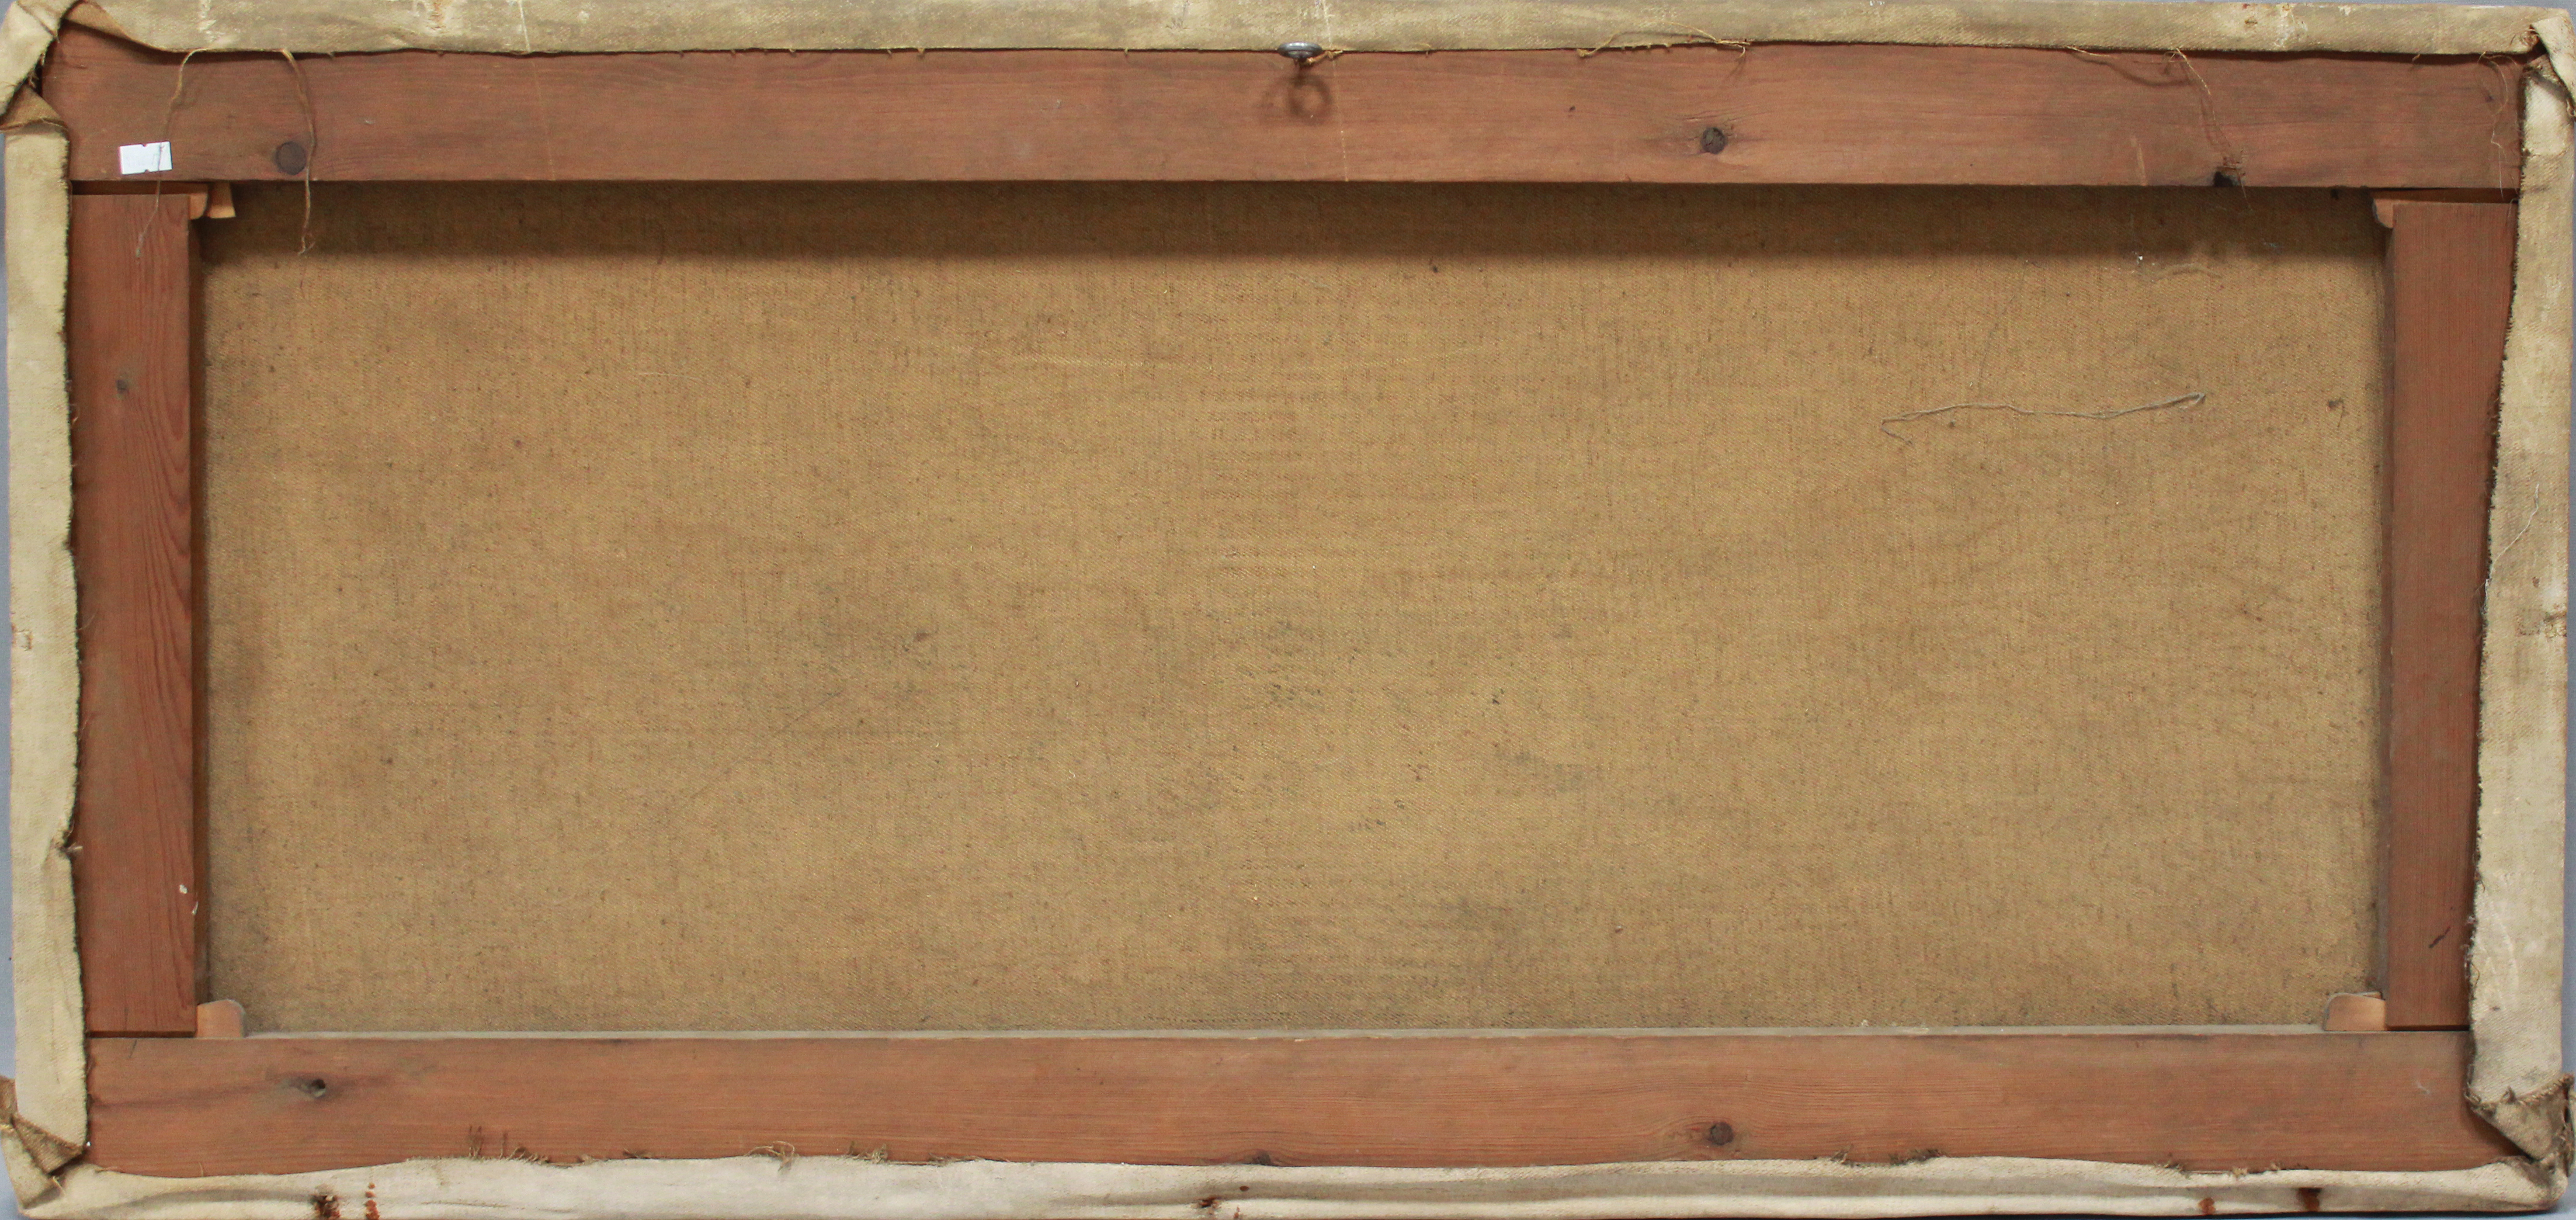 malchin carl 1838 kr pelin schwerin 1923 objektdetail auktionshaus dannenberg gmbh co kg. Black Bedroom Furniture Sets. Home Design Ideas